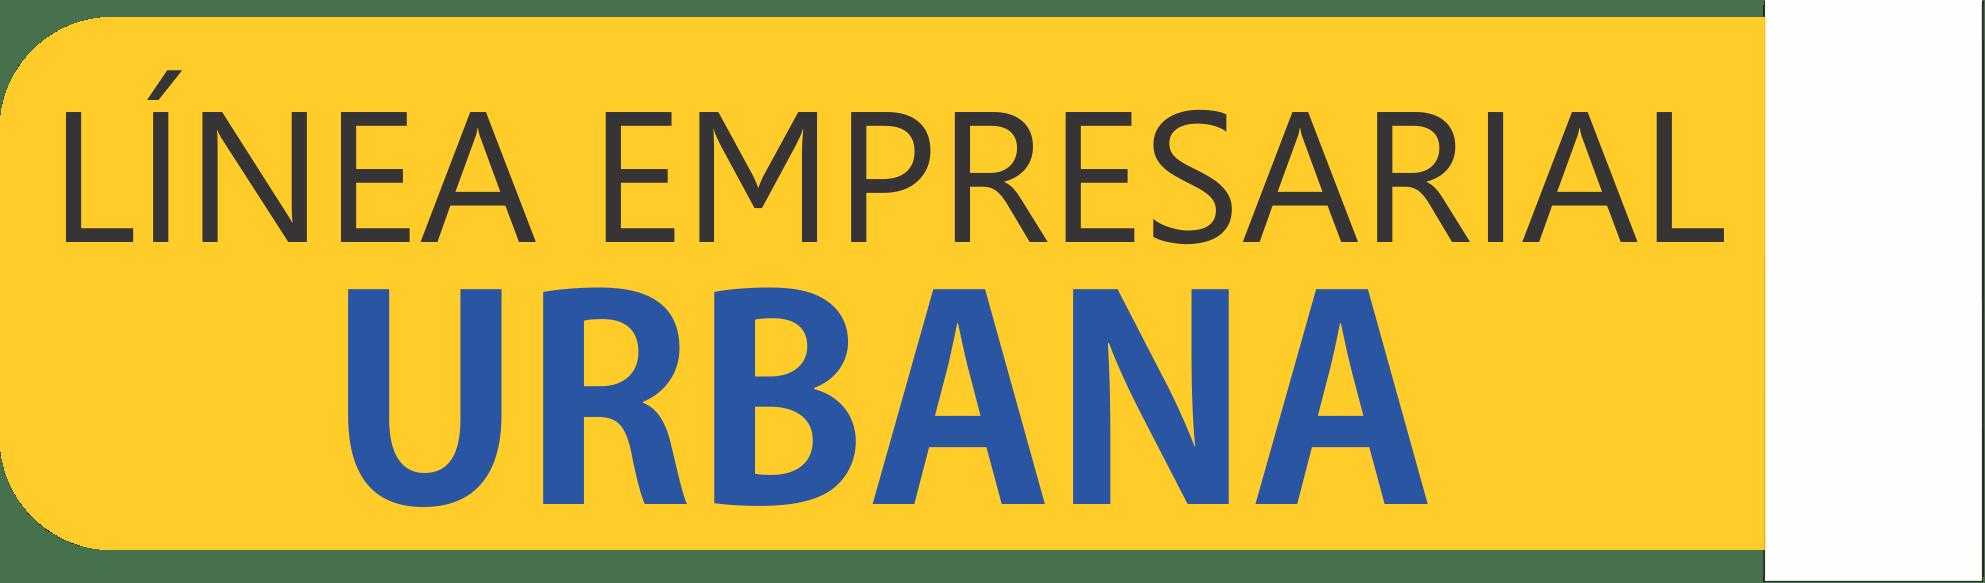 banner línea empresarial urbana